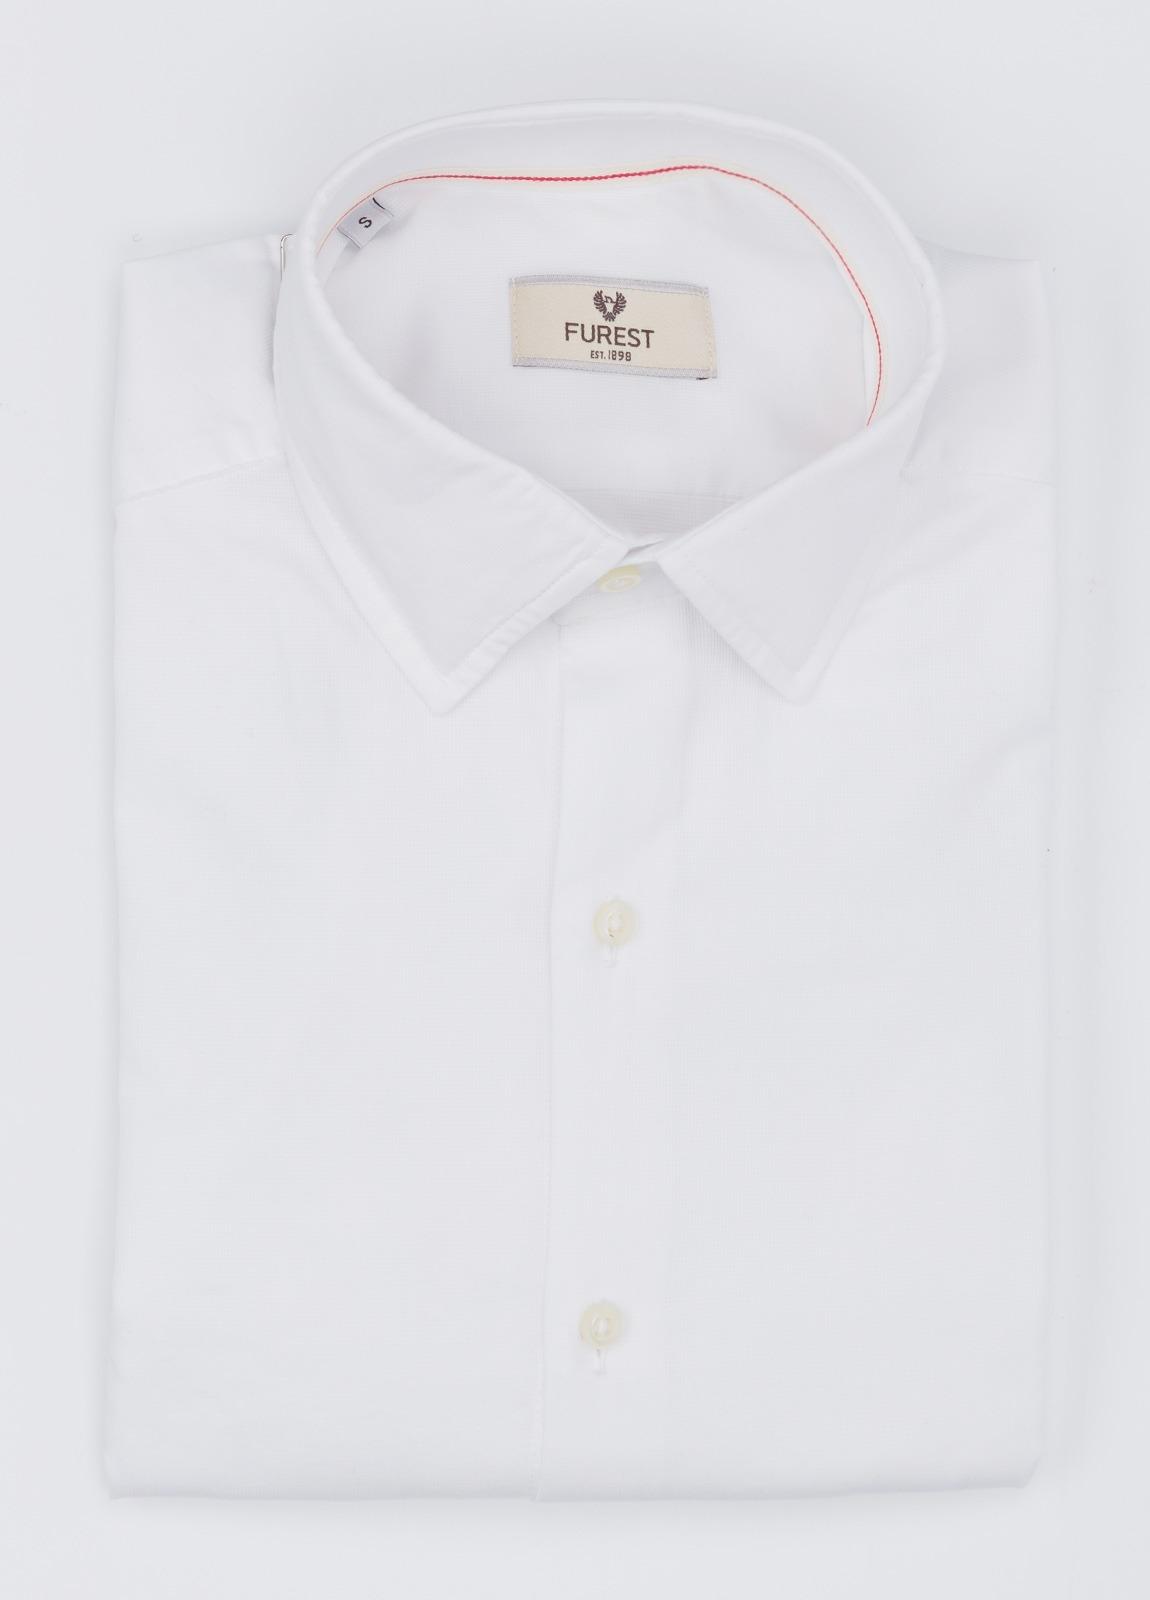 Camisa Leisure Wear SLIM FIT modelo PORTO, color blanco. 100% Algodón.